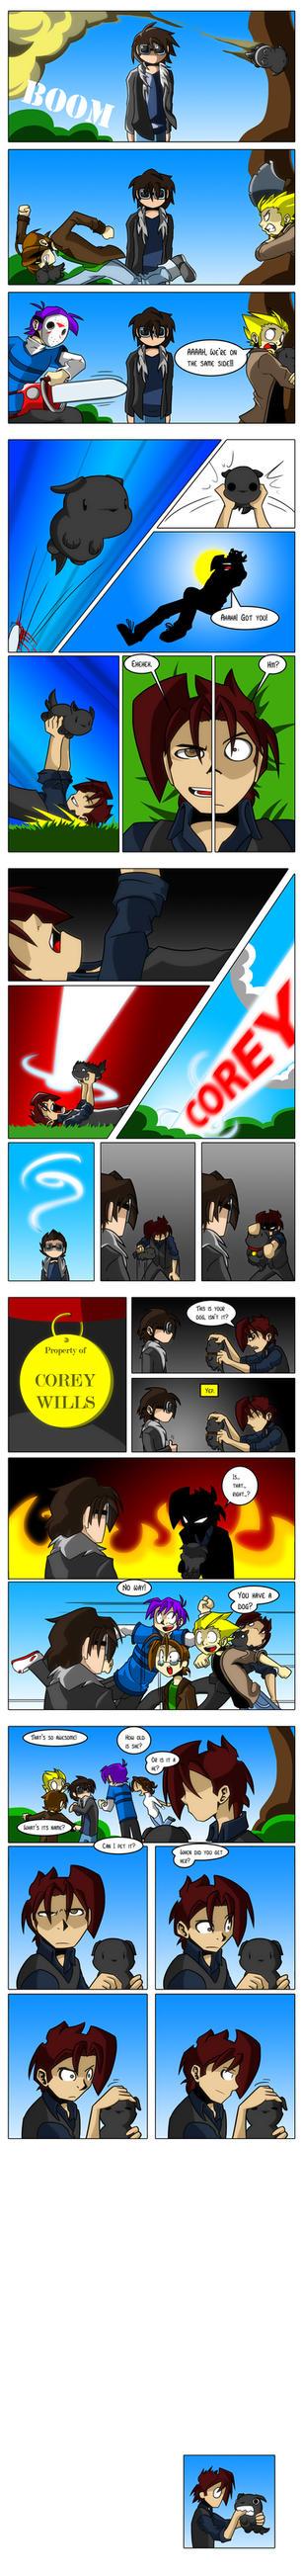 Comic Book Book 47 - The Book by DukeStewart